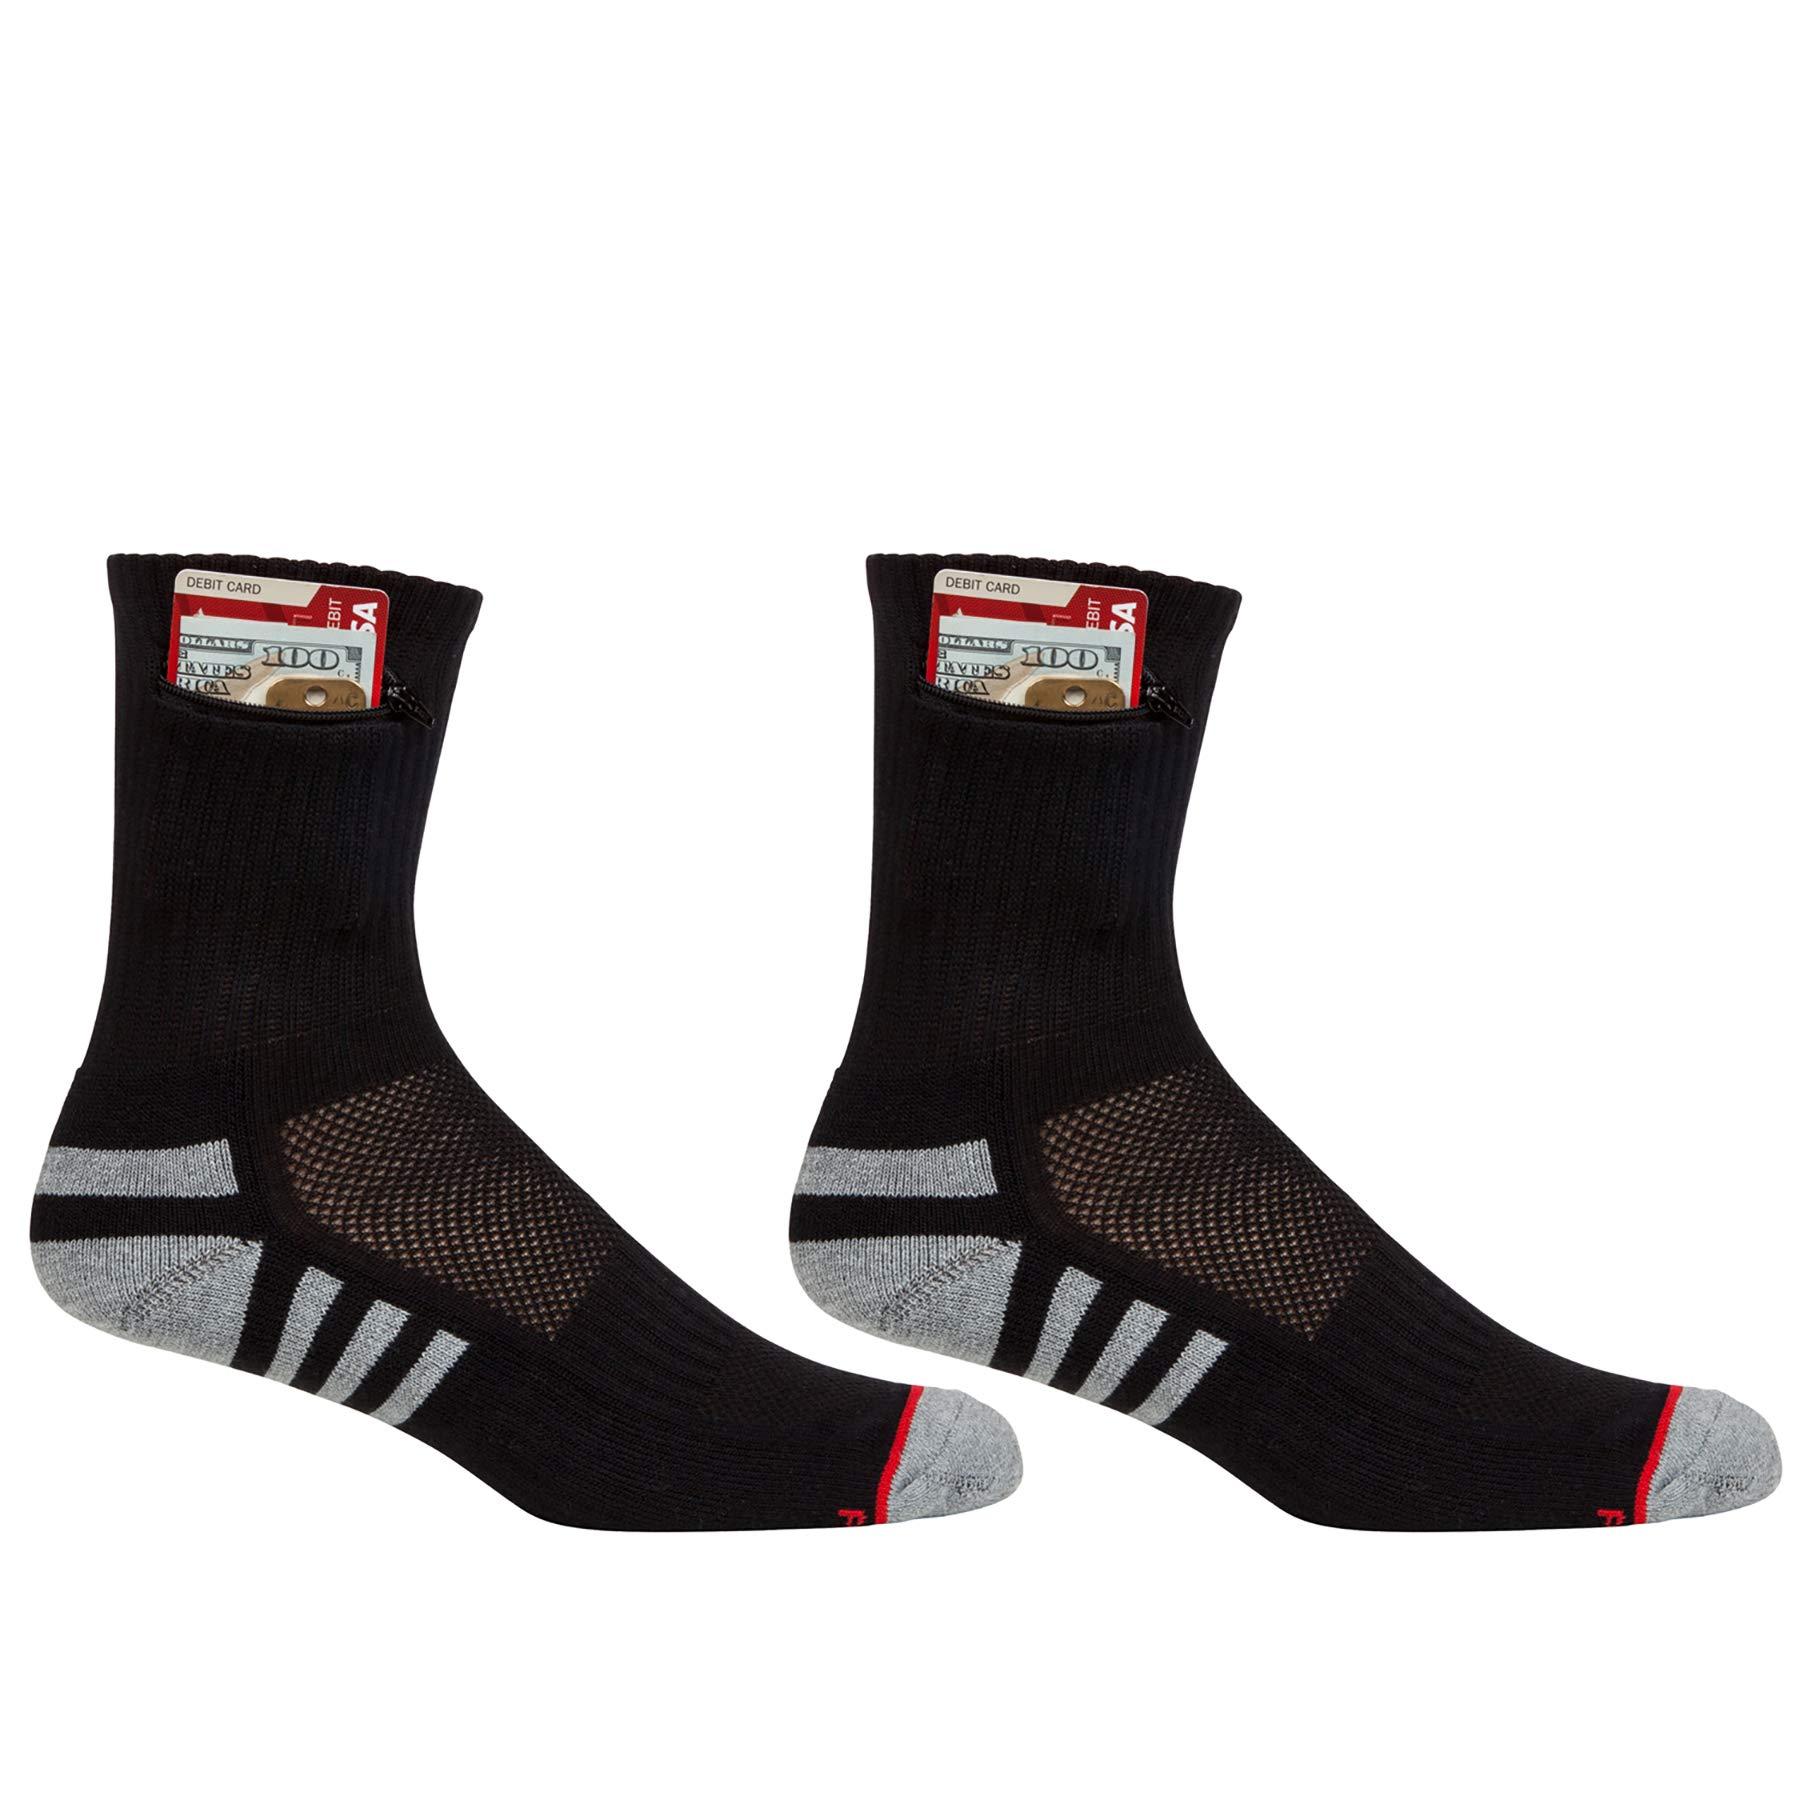 Pocket Socks Men's 2-Pack Athletic Travel Ankle Socks with Hidden Zip Security Pocket for ID, Key or Cash Money, One Size Fits Most, Black, 2 Pair by Pocket Socks